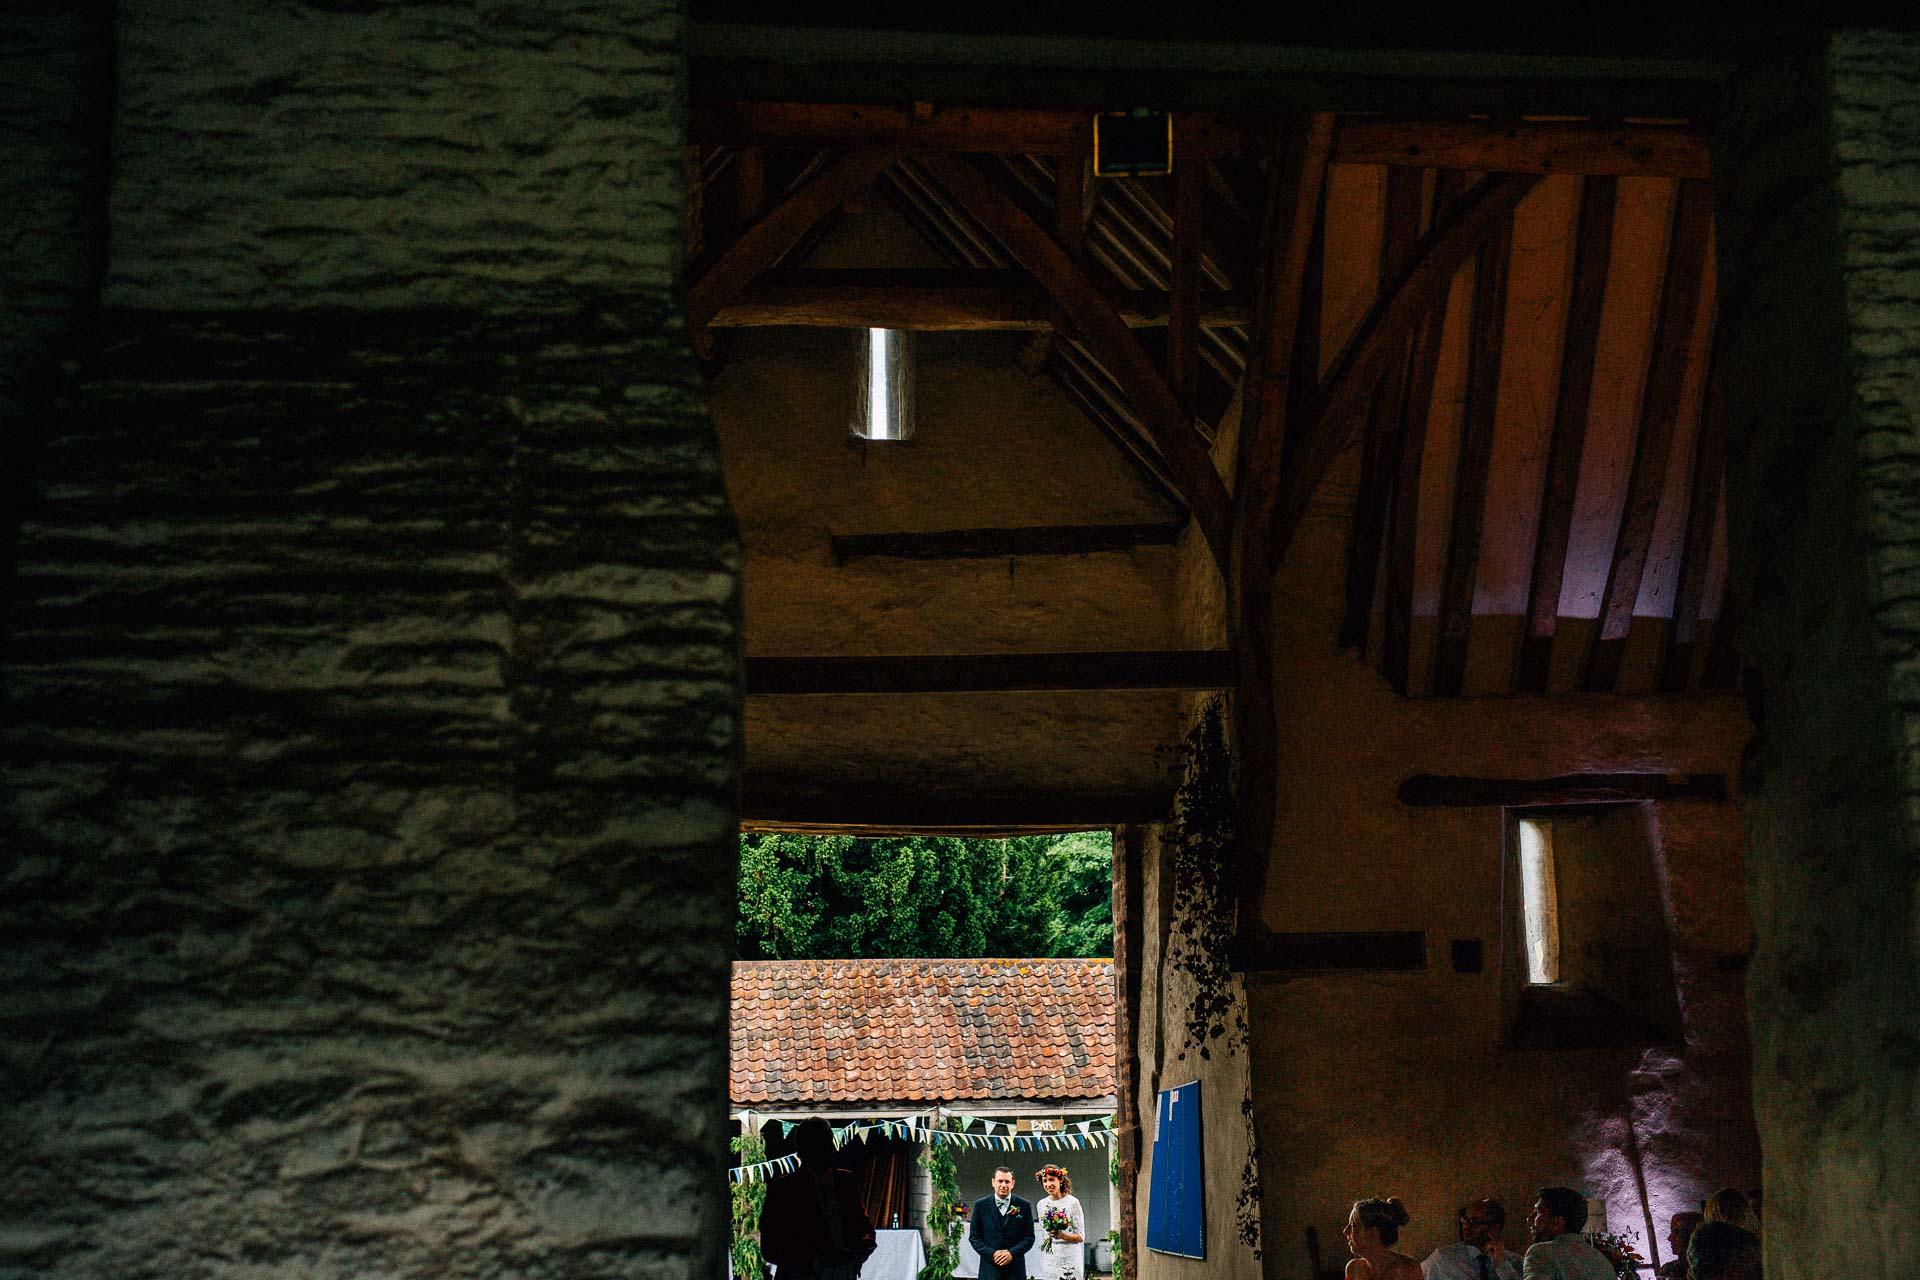 winterbourne-medieval-barn-wedding-photography-emma-andrew-89